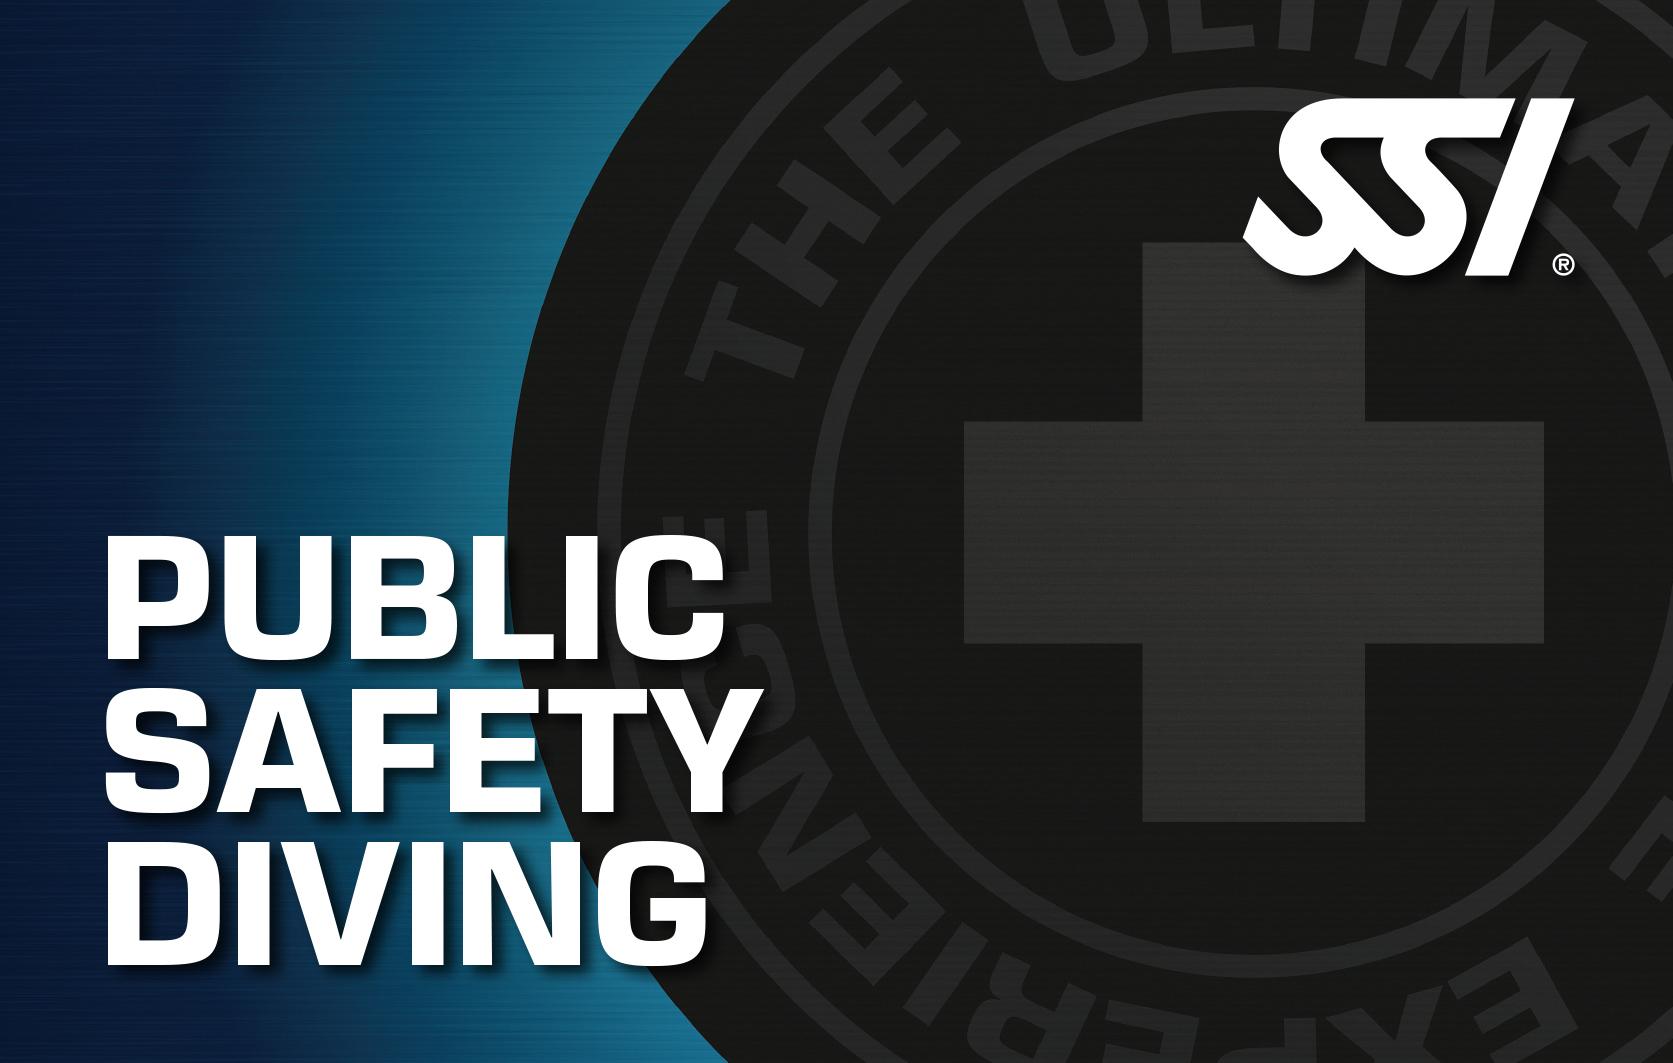 SSI Public Safety Diver